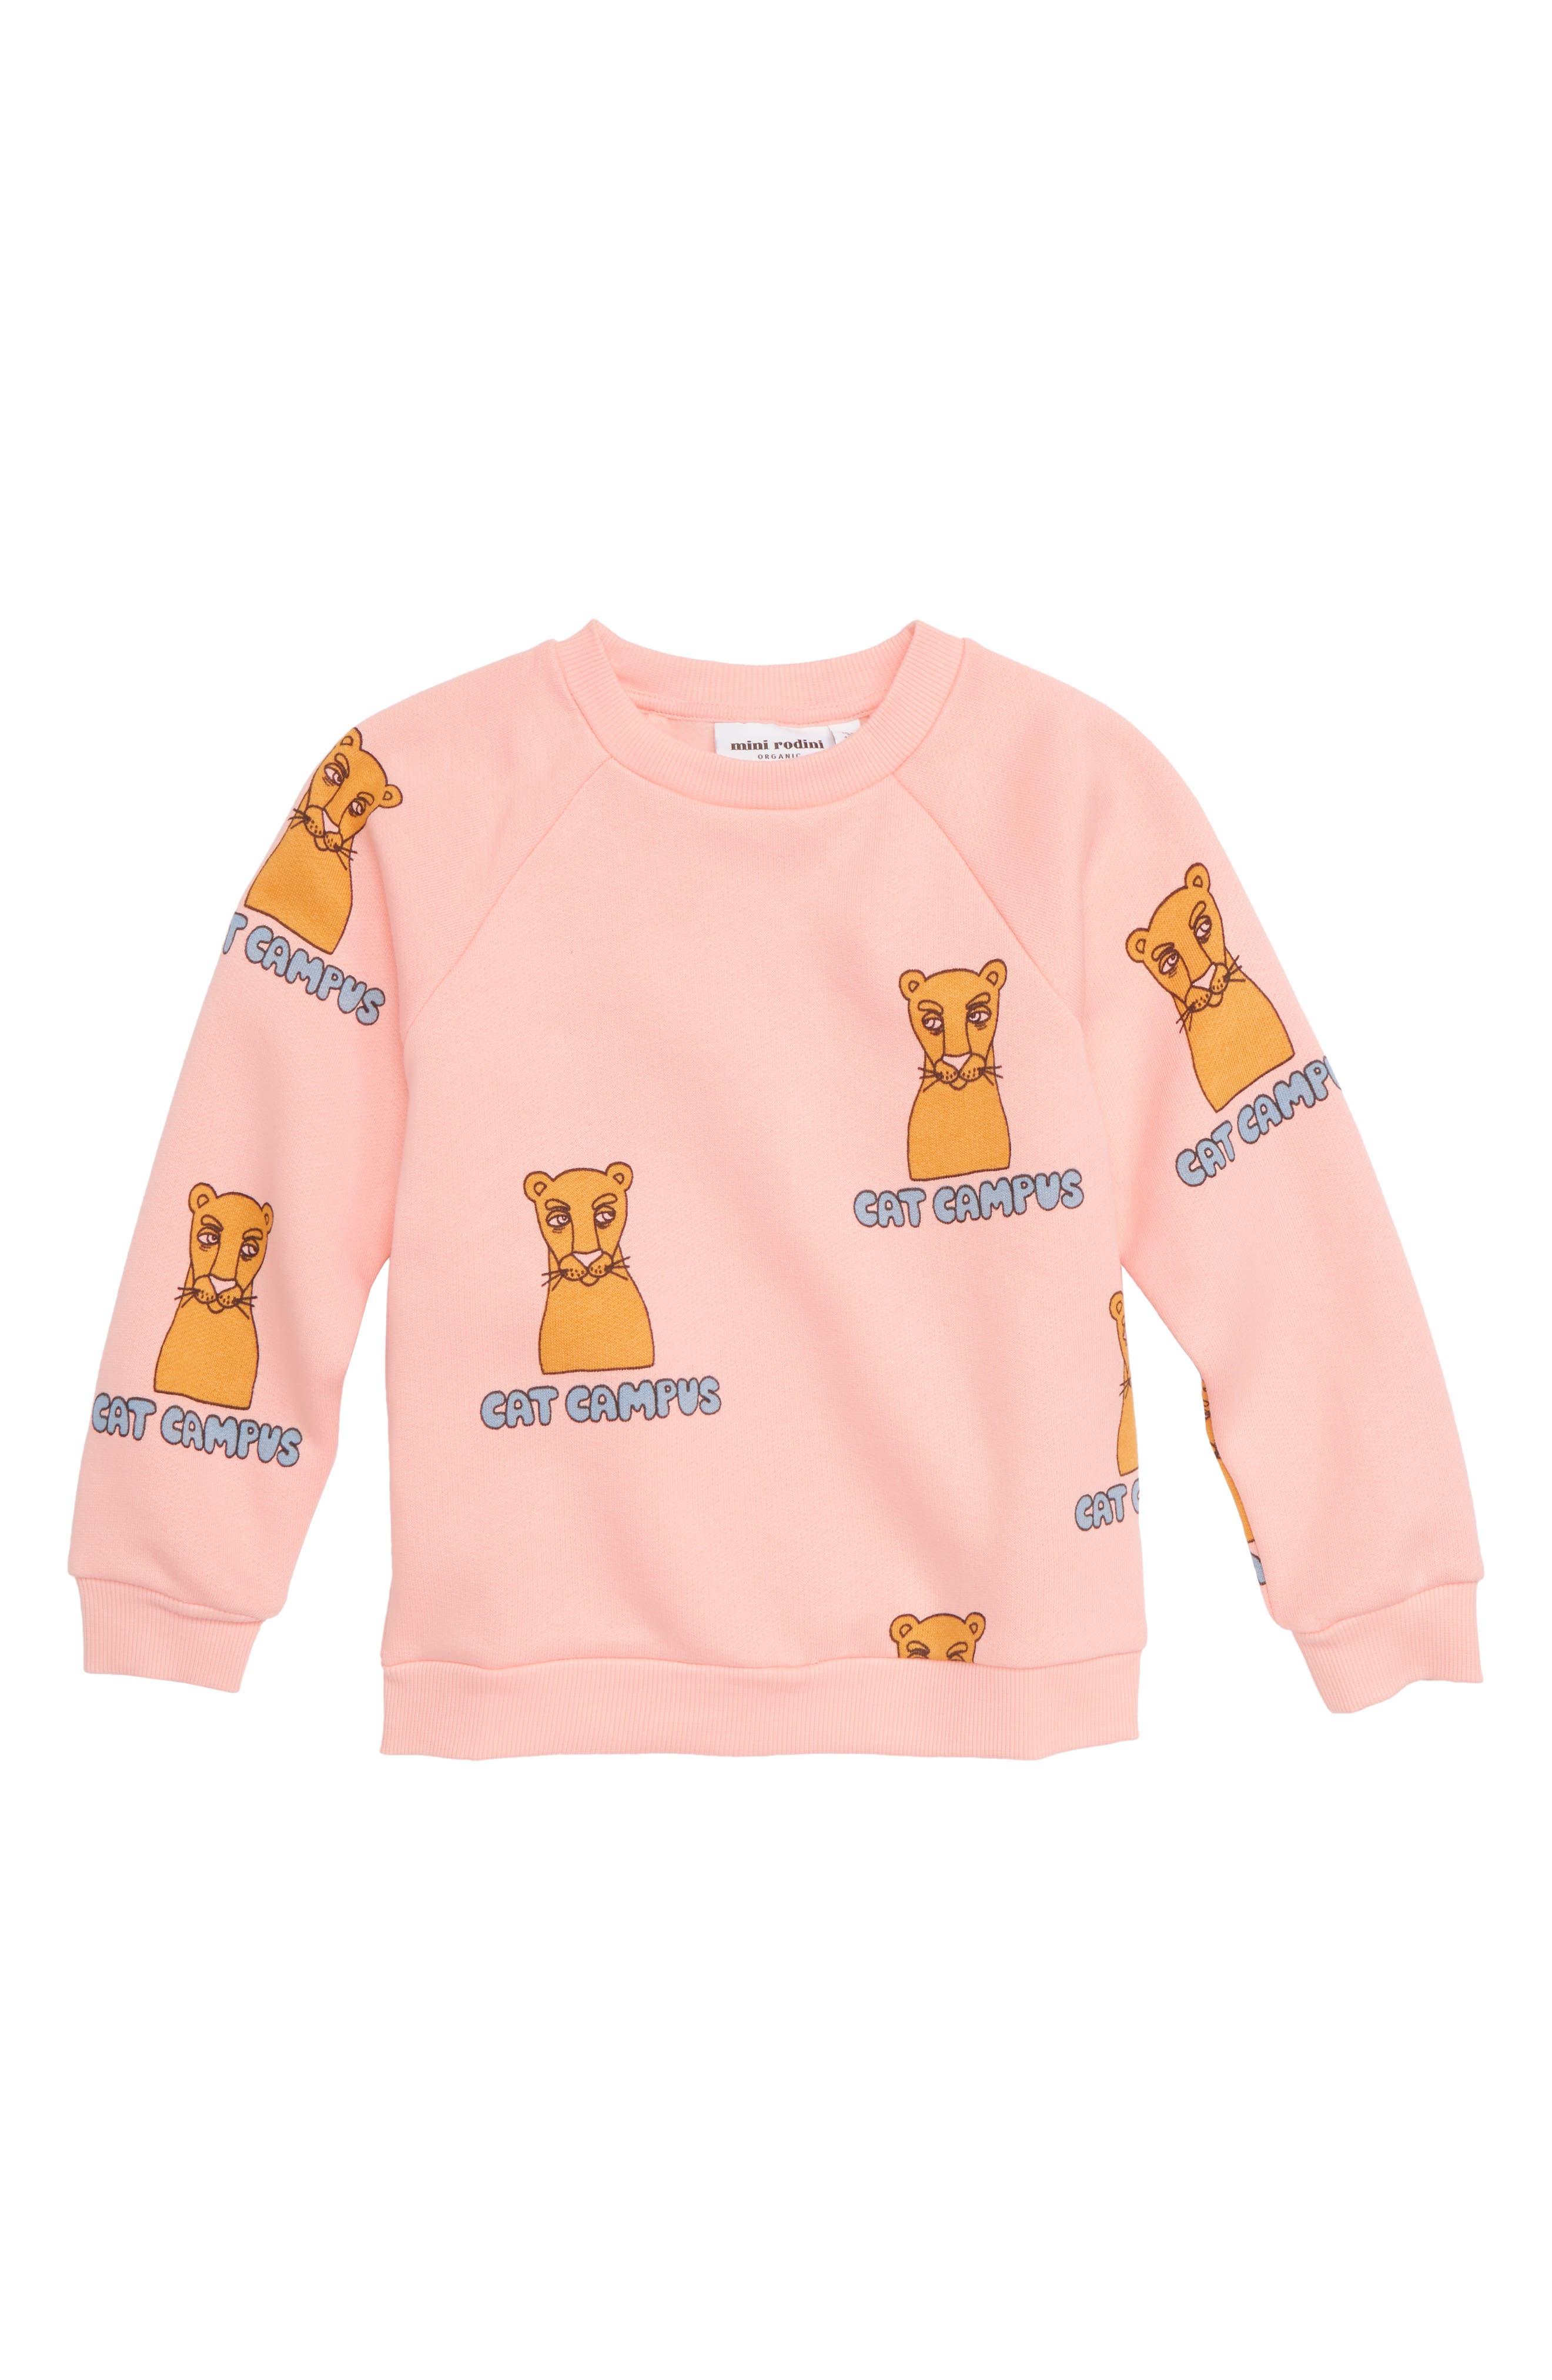 Cat Campus Organic Cotton Sweatshirt,                         Main,                         color, PINK